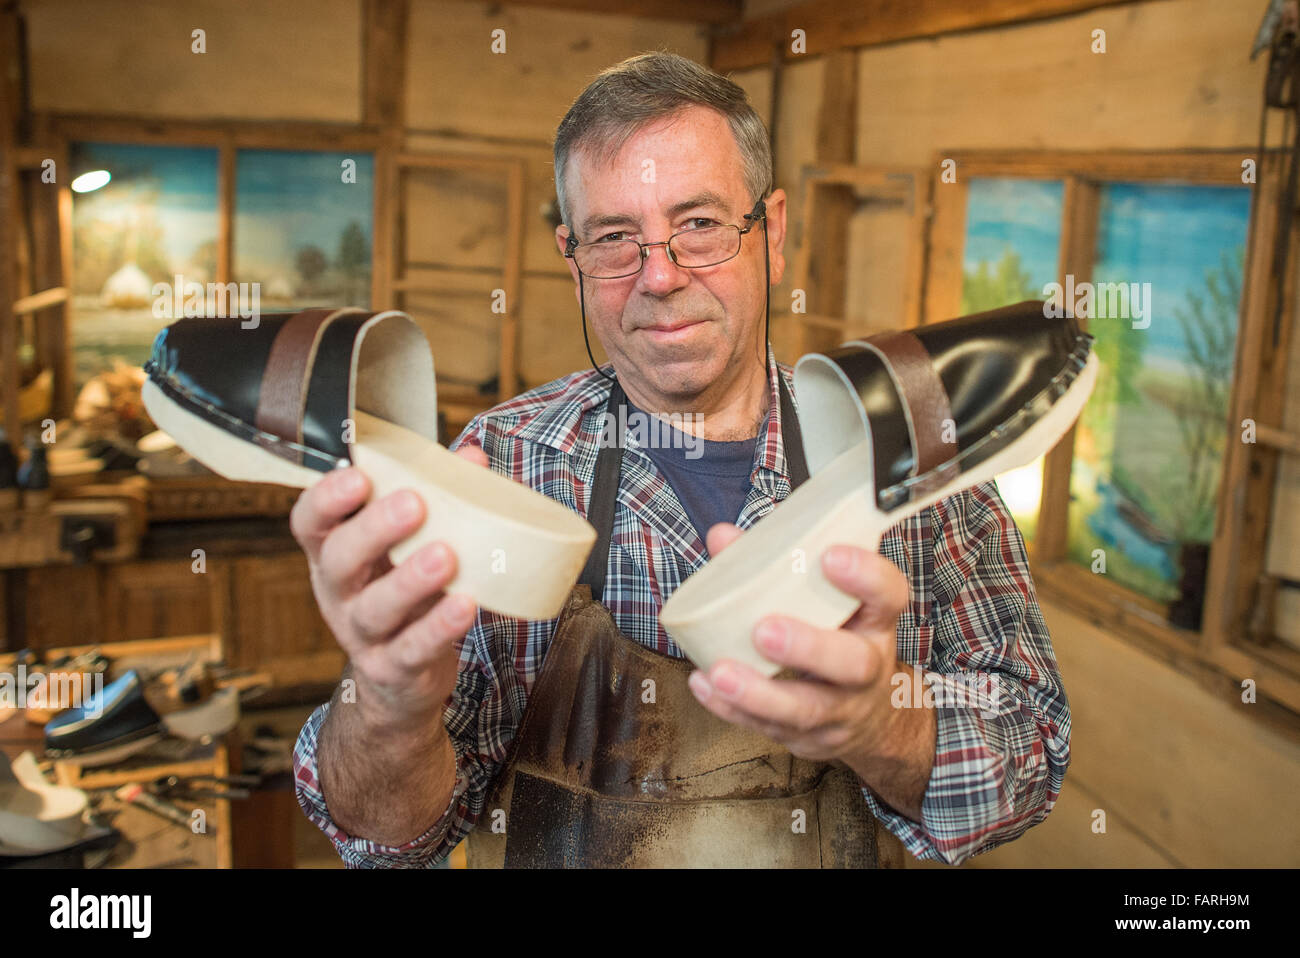 Burg, Germany. 07th Dec, 2015. Manfred Karolczak holds up wooden slippers at his workshop in Burg, Germany, 07 December - Stock Image